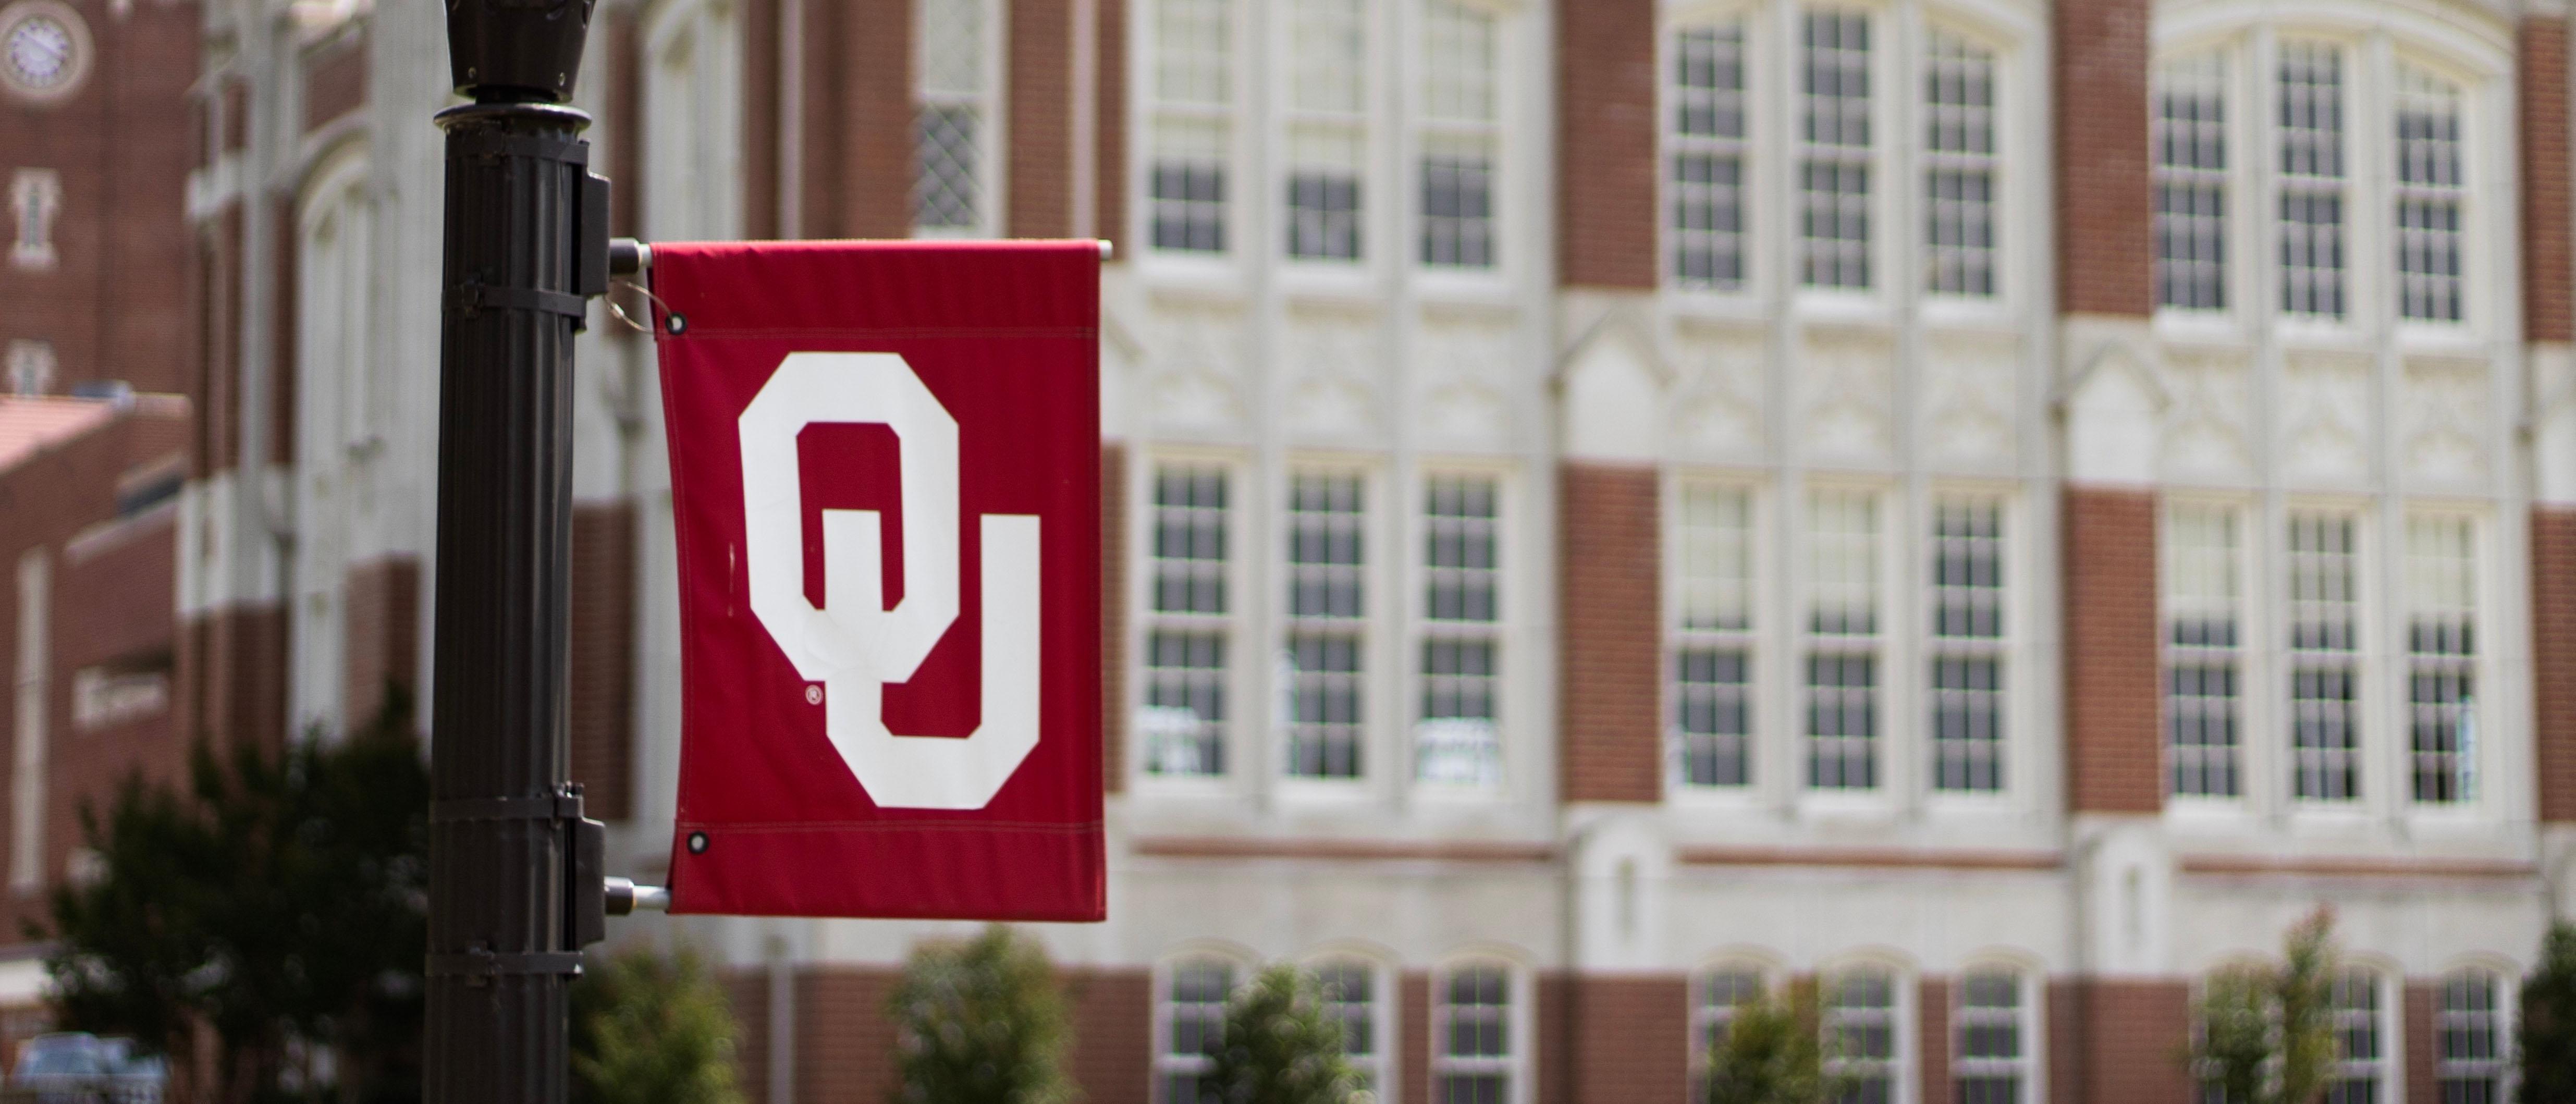 University Of Oklahoma Removes Pledge Of Allegiance From Agenda